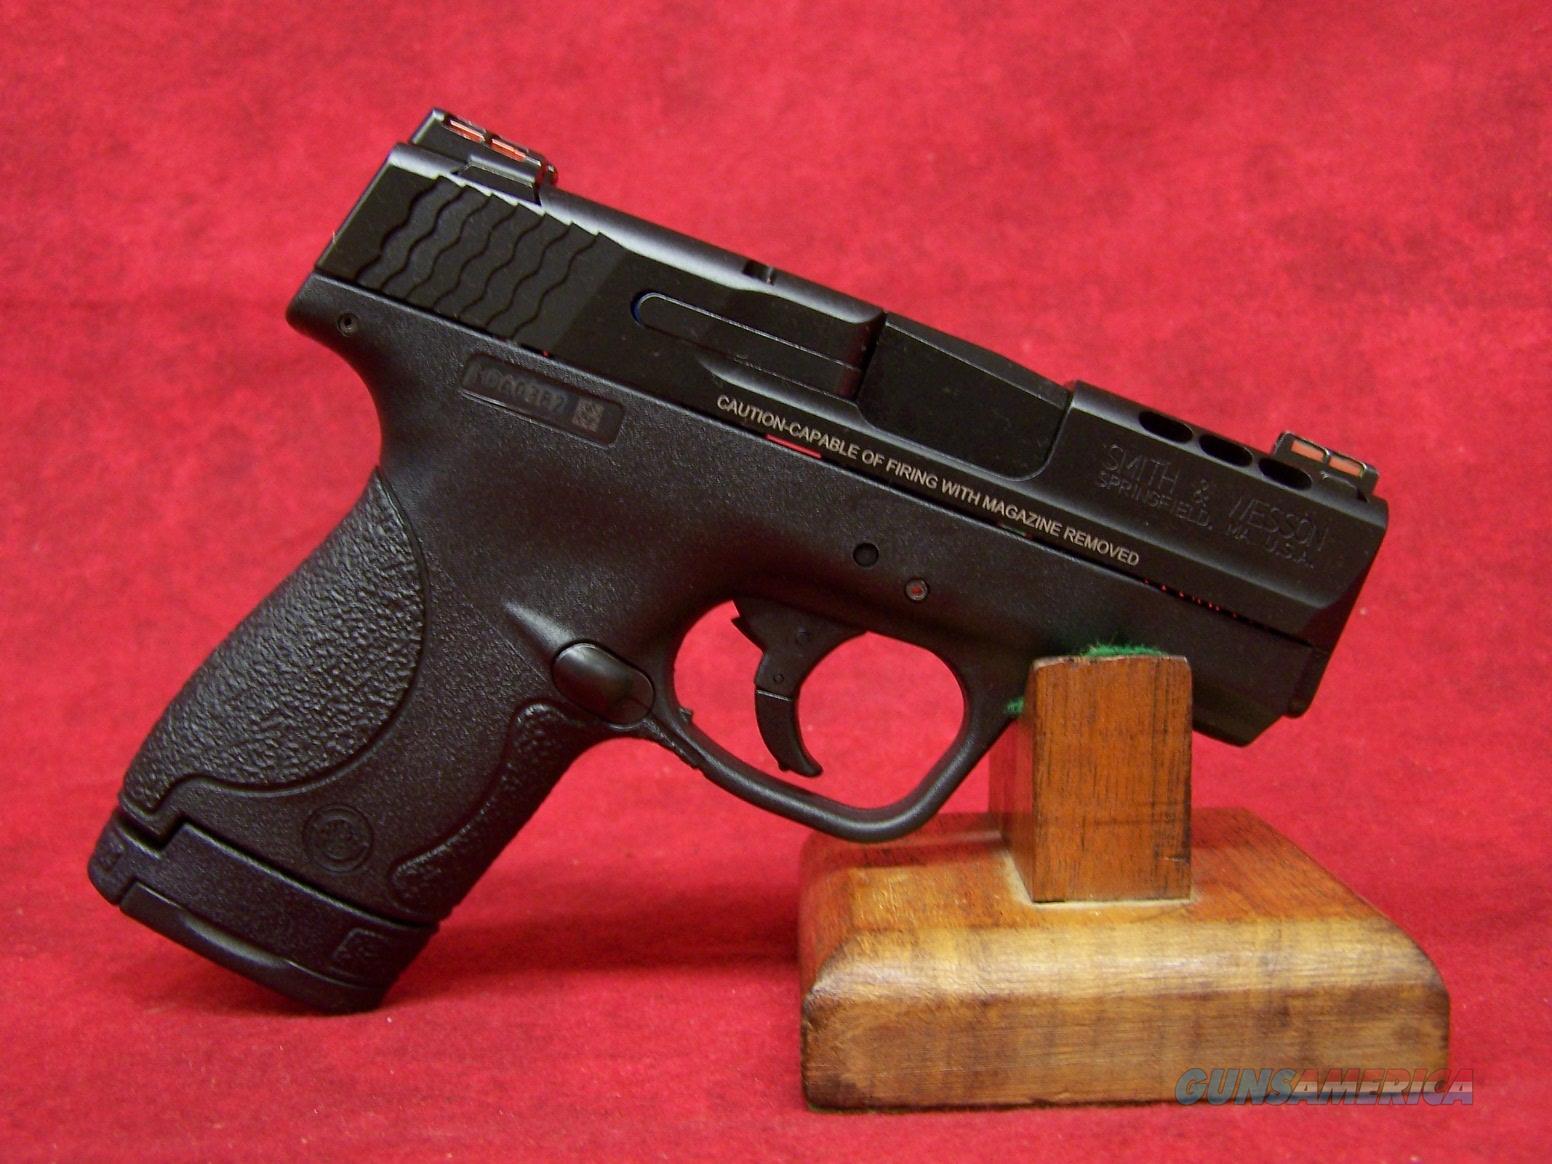 Smith & Wesson M&P Shield Ported .40 S&W 3.1 Inch Ported Barrel Black Melonite Finish (10109)  Guns > Pistols > Smith & Wesson Pistols - Autos > Shield